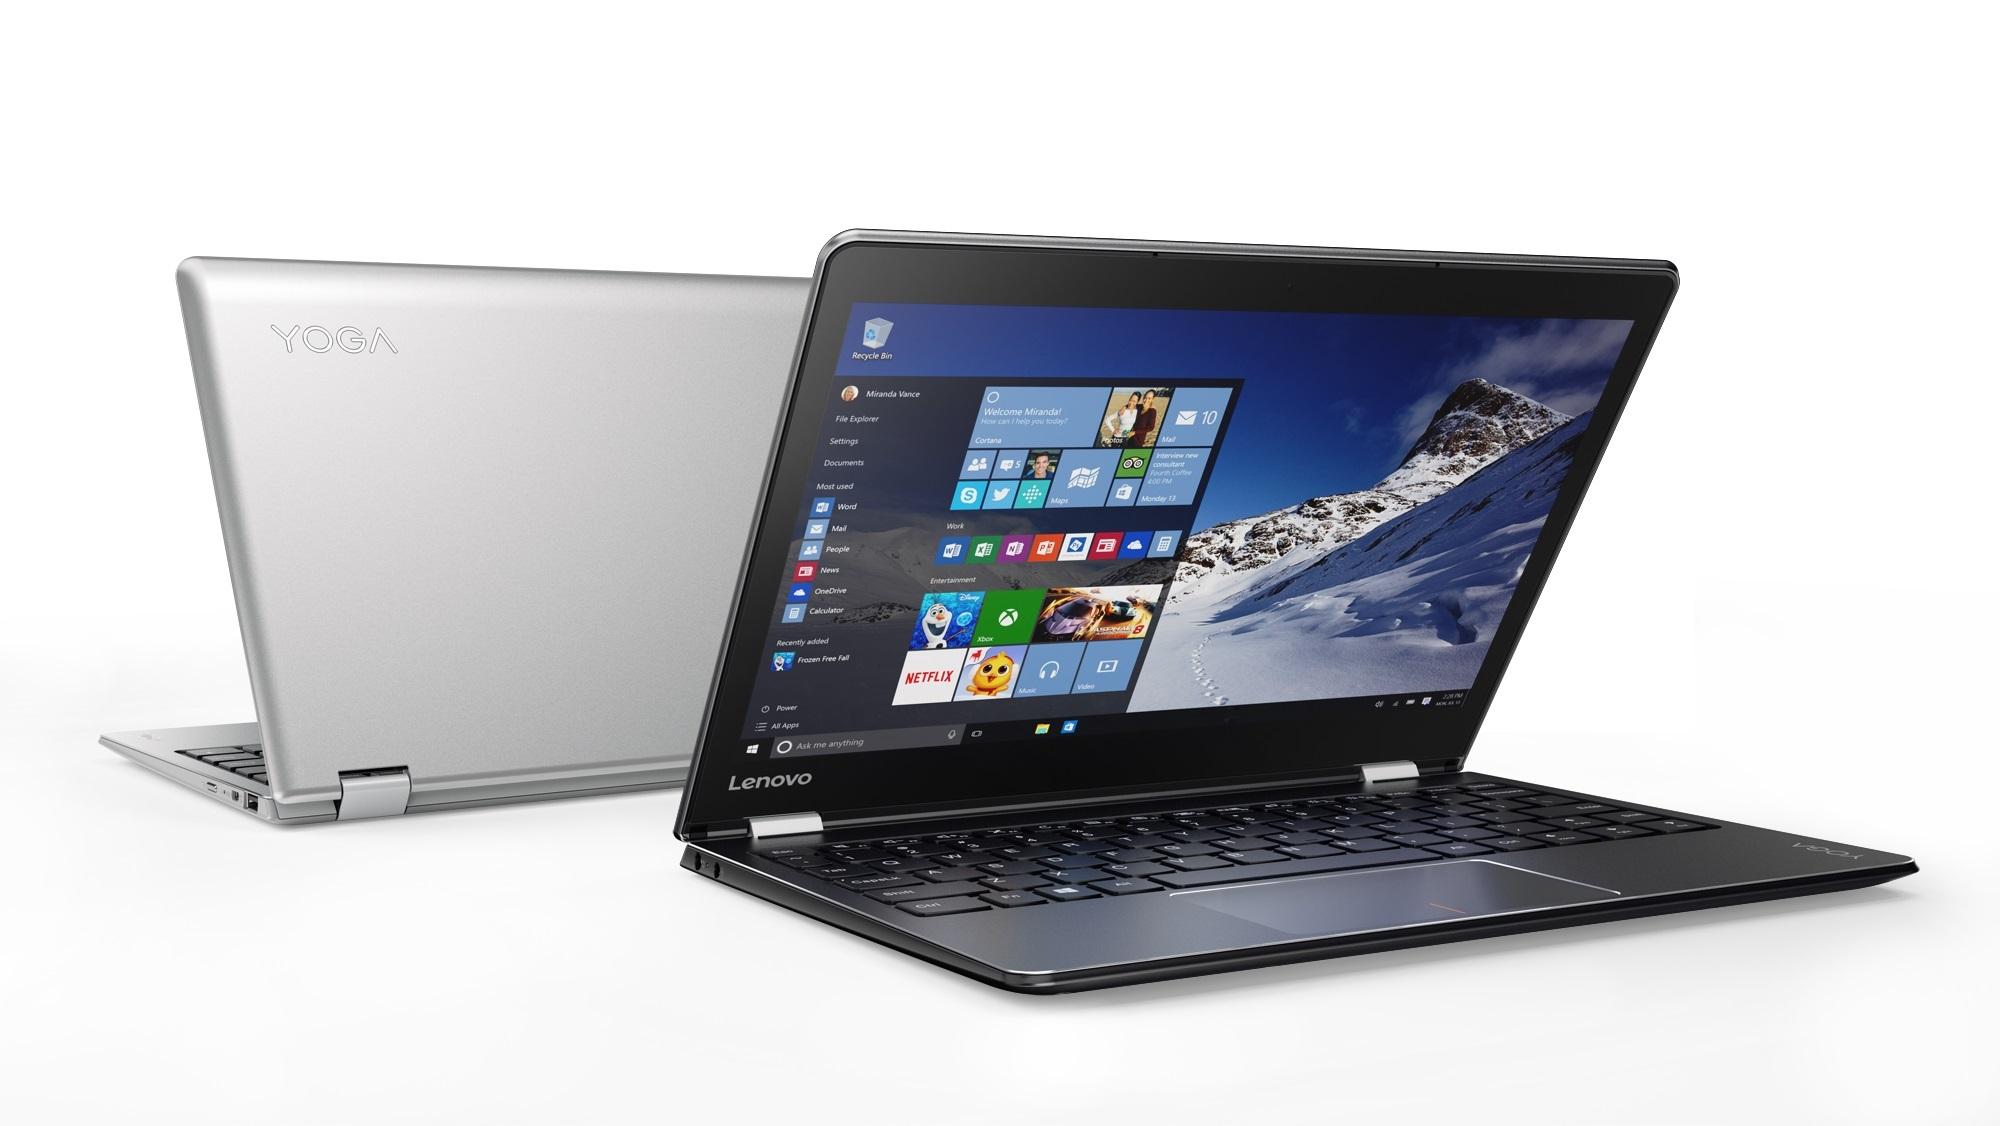 Image result for Lenovo Yoga 710 (11-inch)